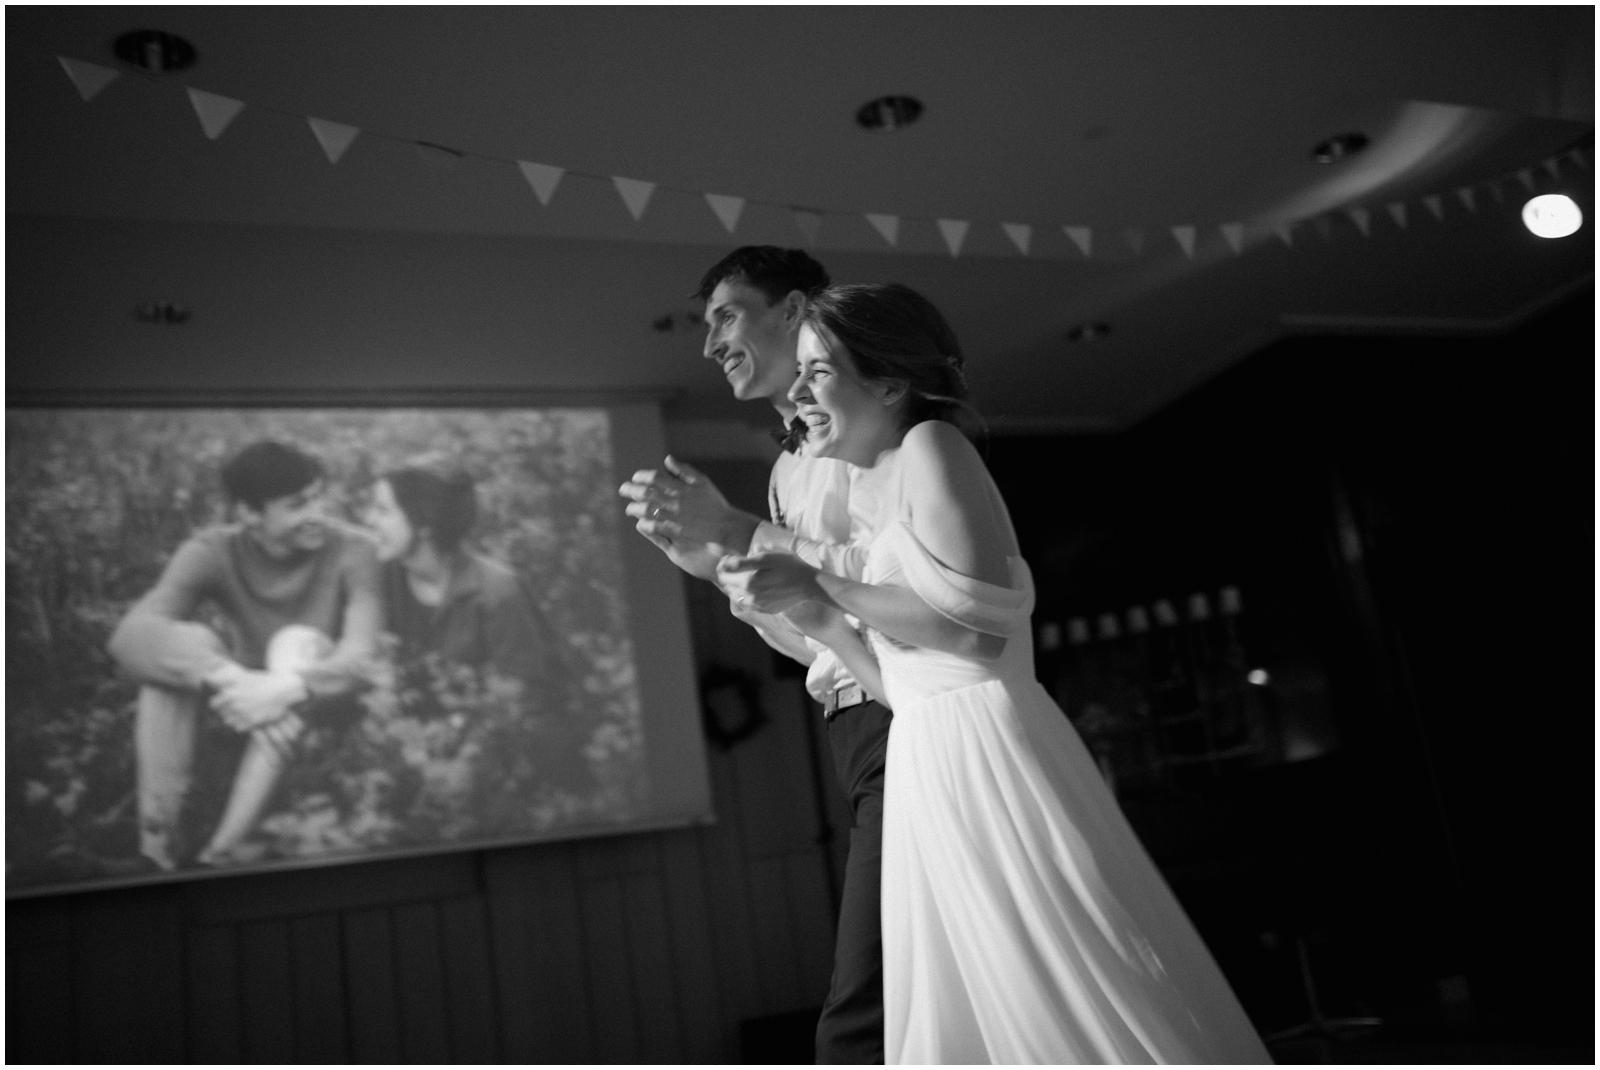 mirjam_thomas_wedding-675-2.jpg